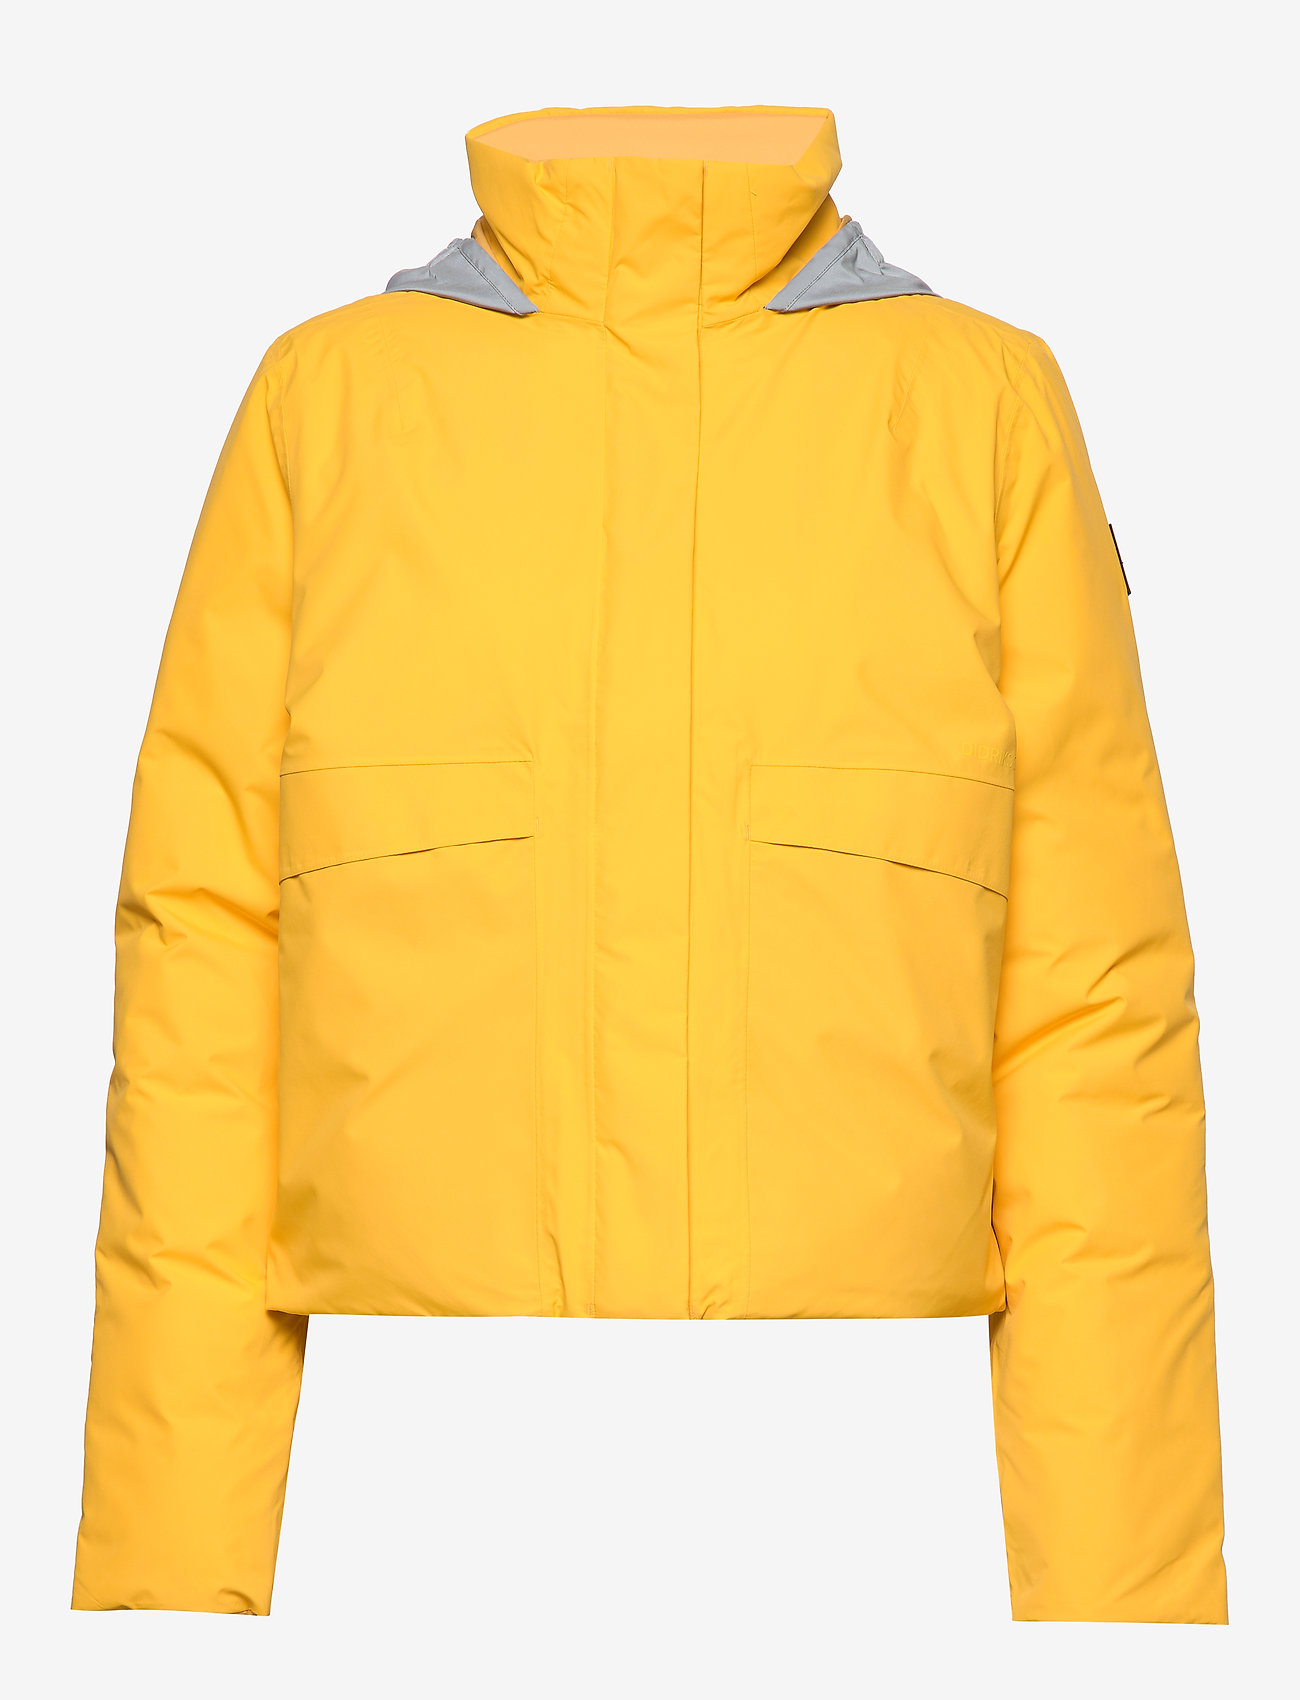 Kim Wns Jkt (Oat Yellow) - Didriksons jSozDy